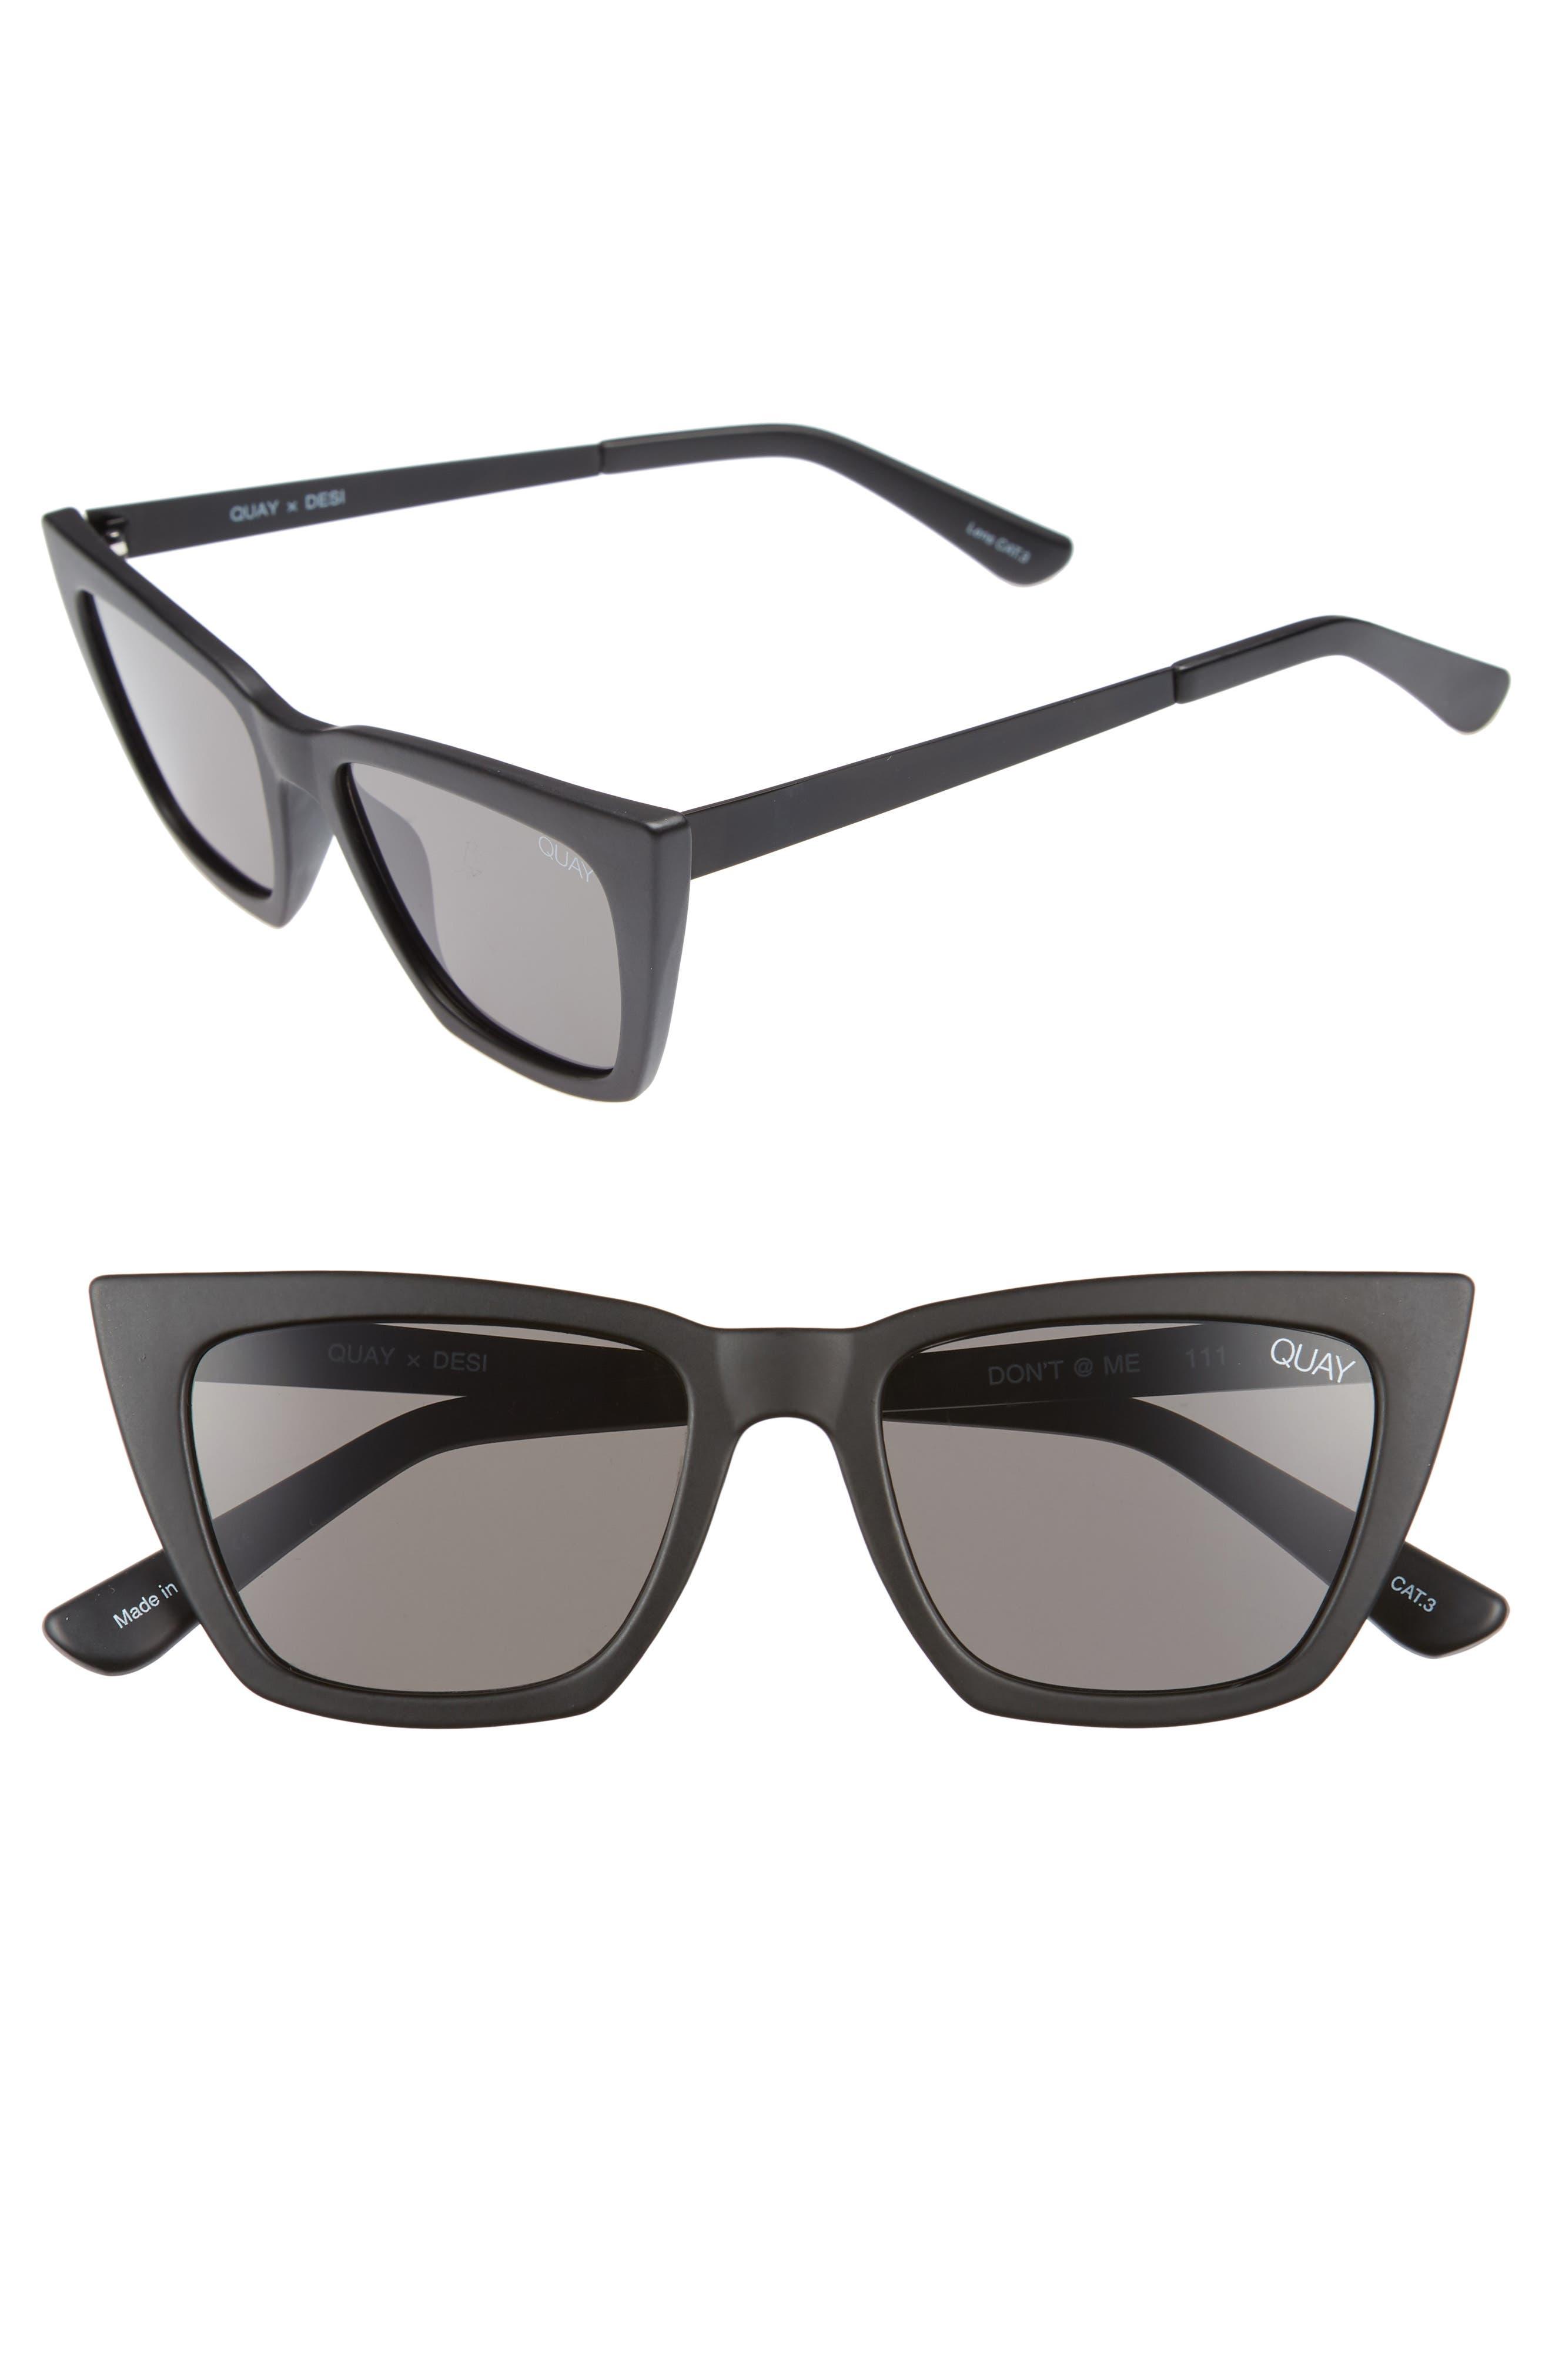 x Desi Perkins Don't @ Me 48mm Cat Eye Sunglasses,                         Main,                         color, BLACK/ SMOKE